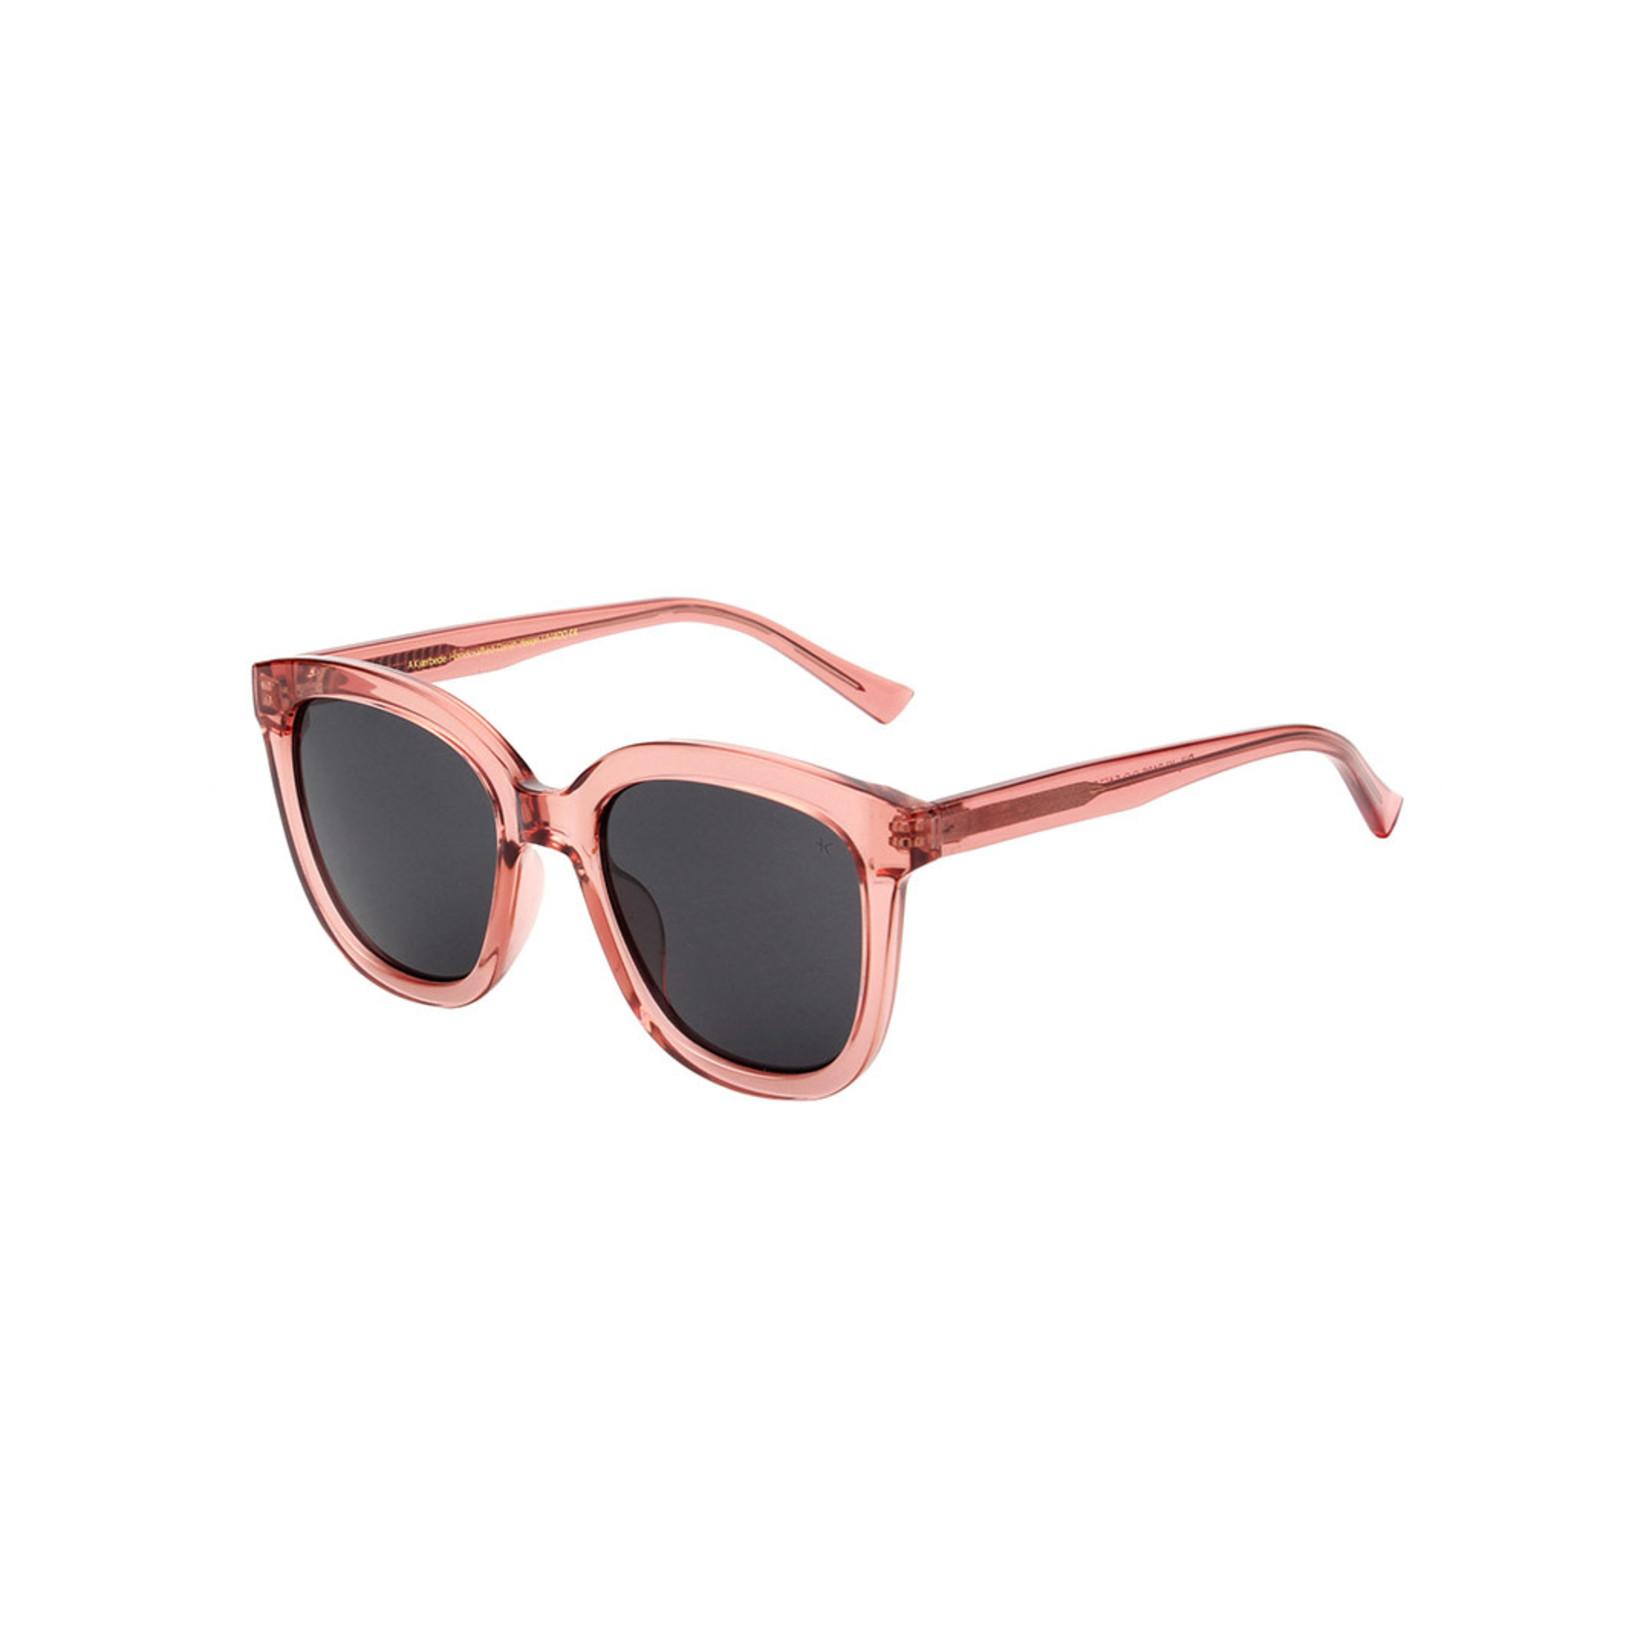 Kjearbede Kjearbede zonnebril Billy Soft Red Transparent /KL2106-003